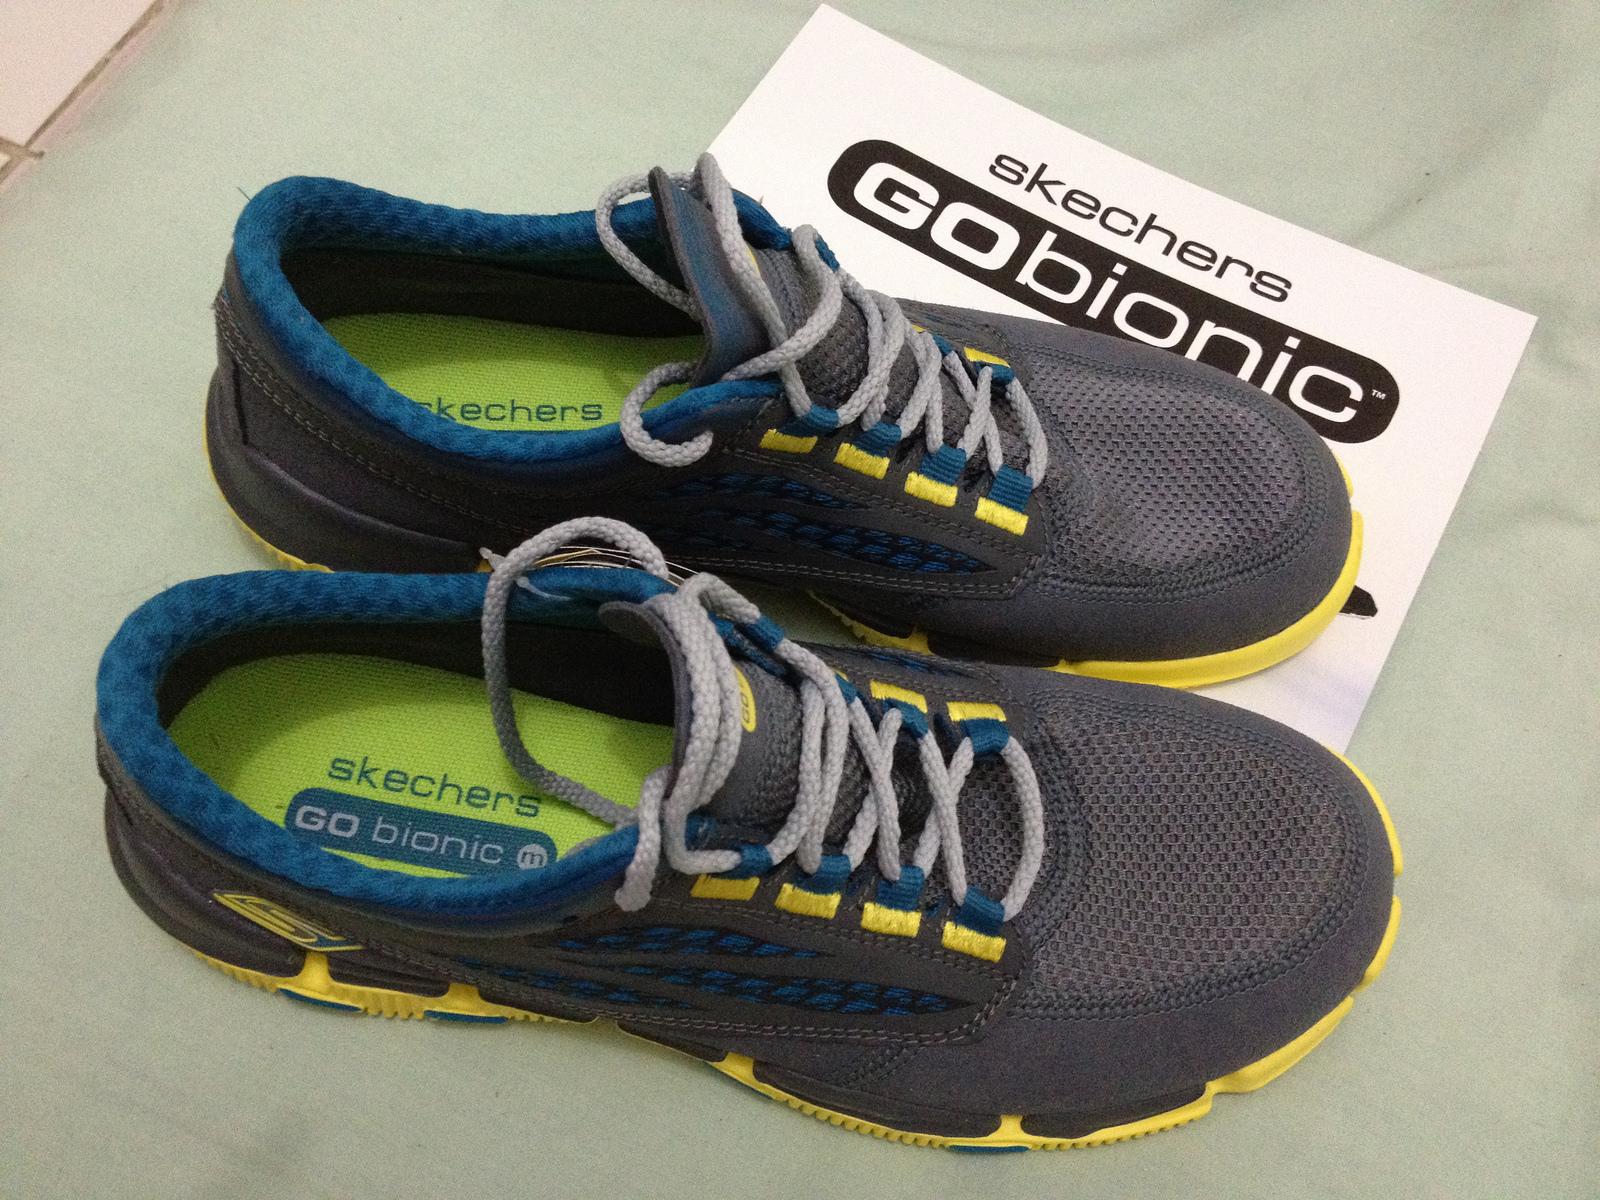 dba6b5ea2439 running shoes  Skechers Go Bionic